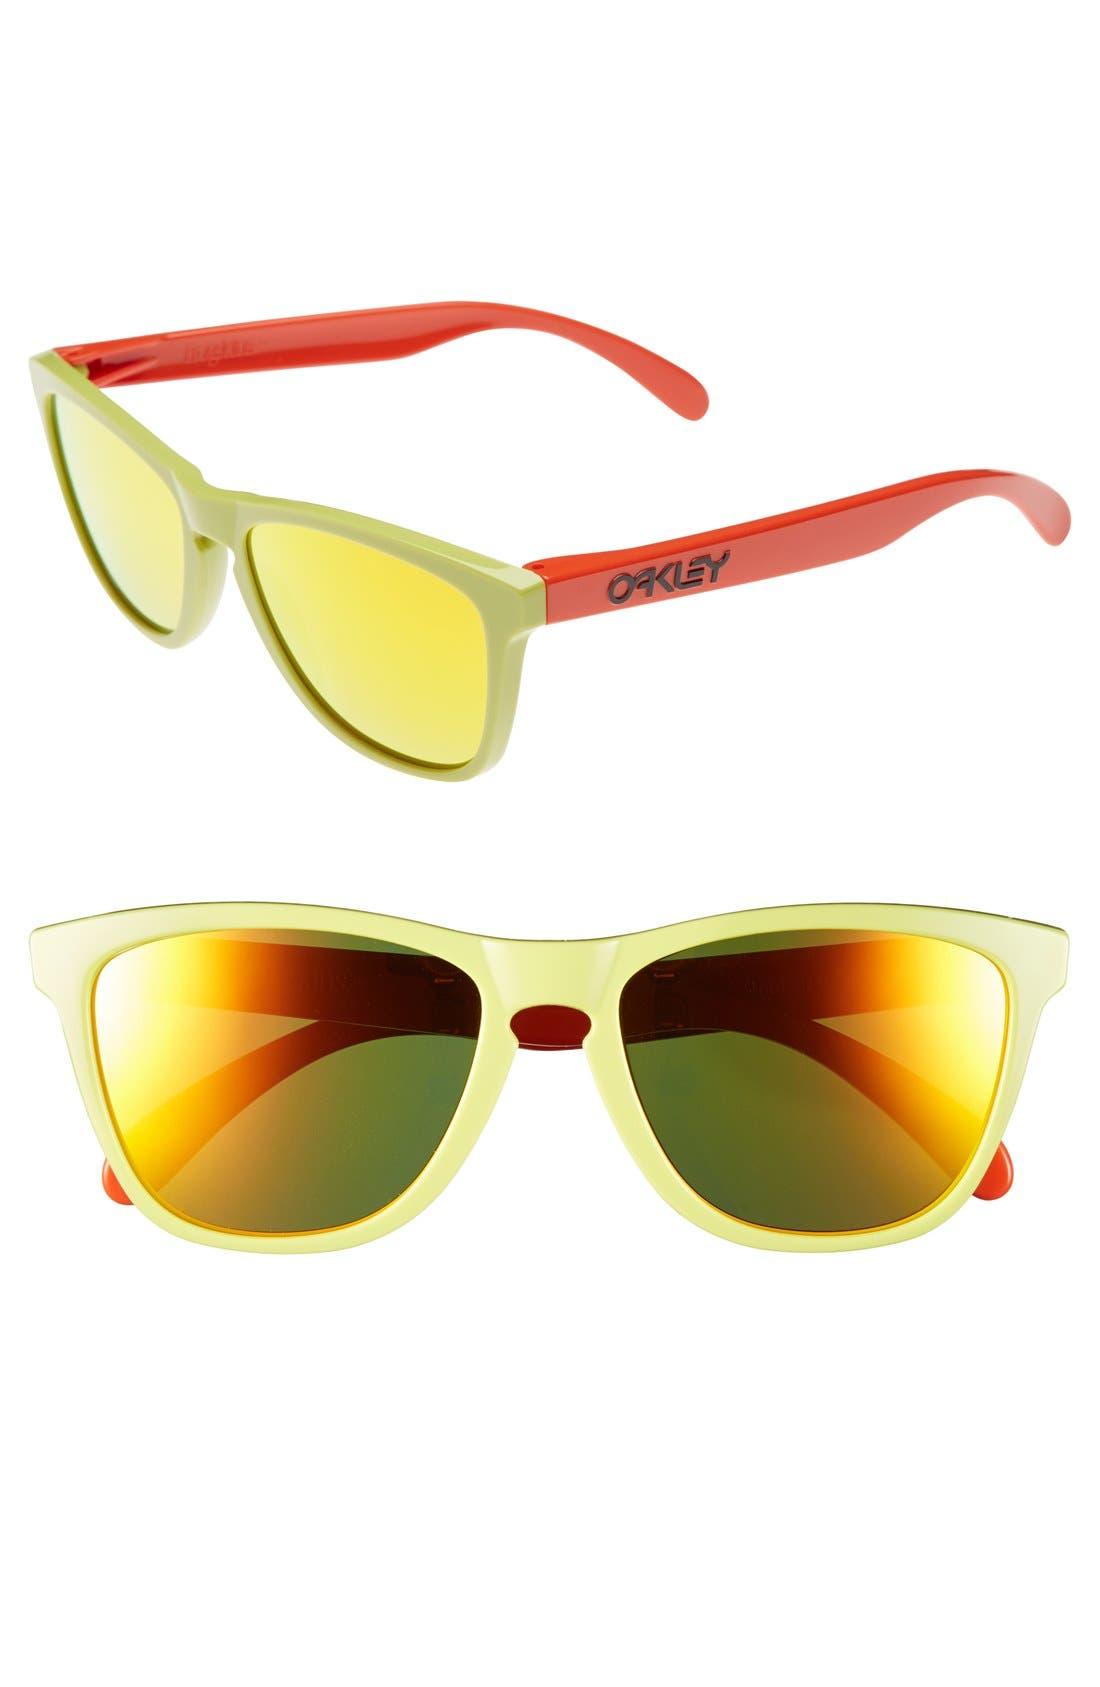 Alternate Image 1 Selected - Oakley 'Frogskins® - Aquatique' 55mm Sunglasses